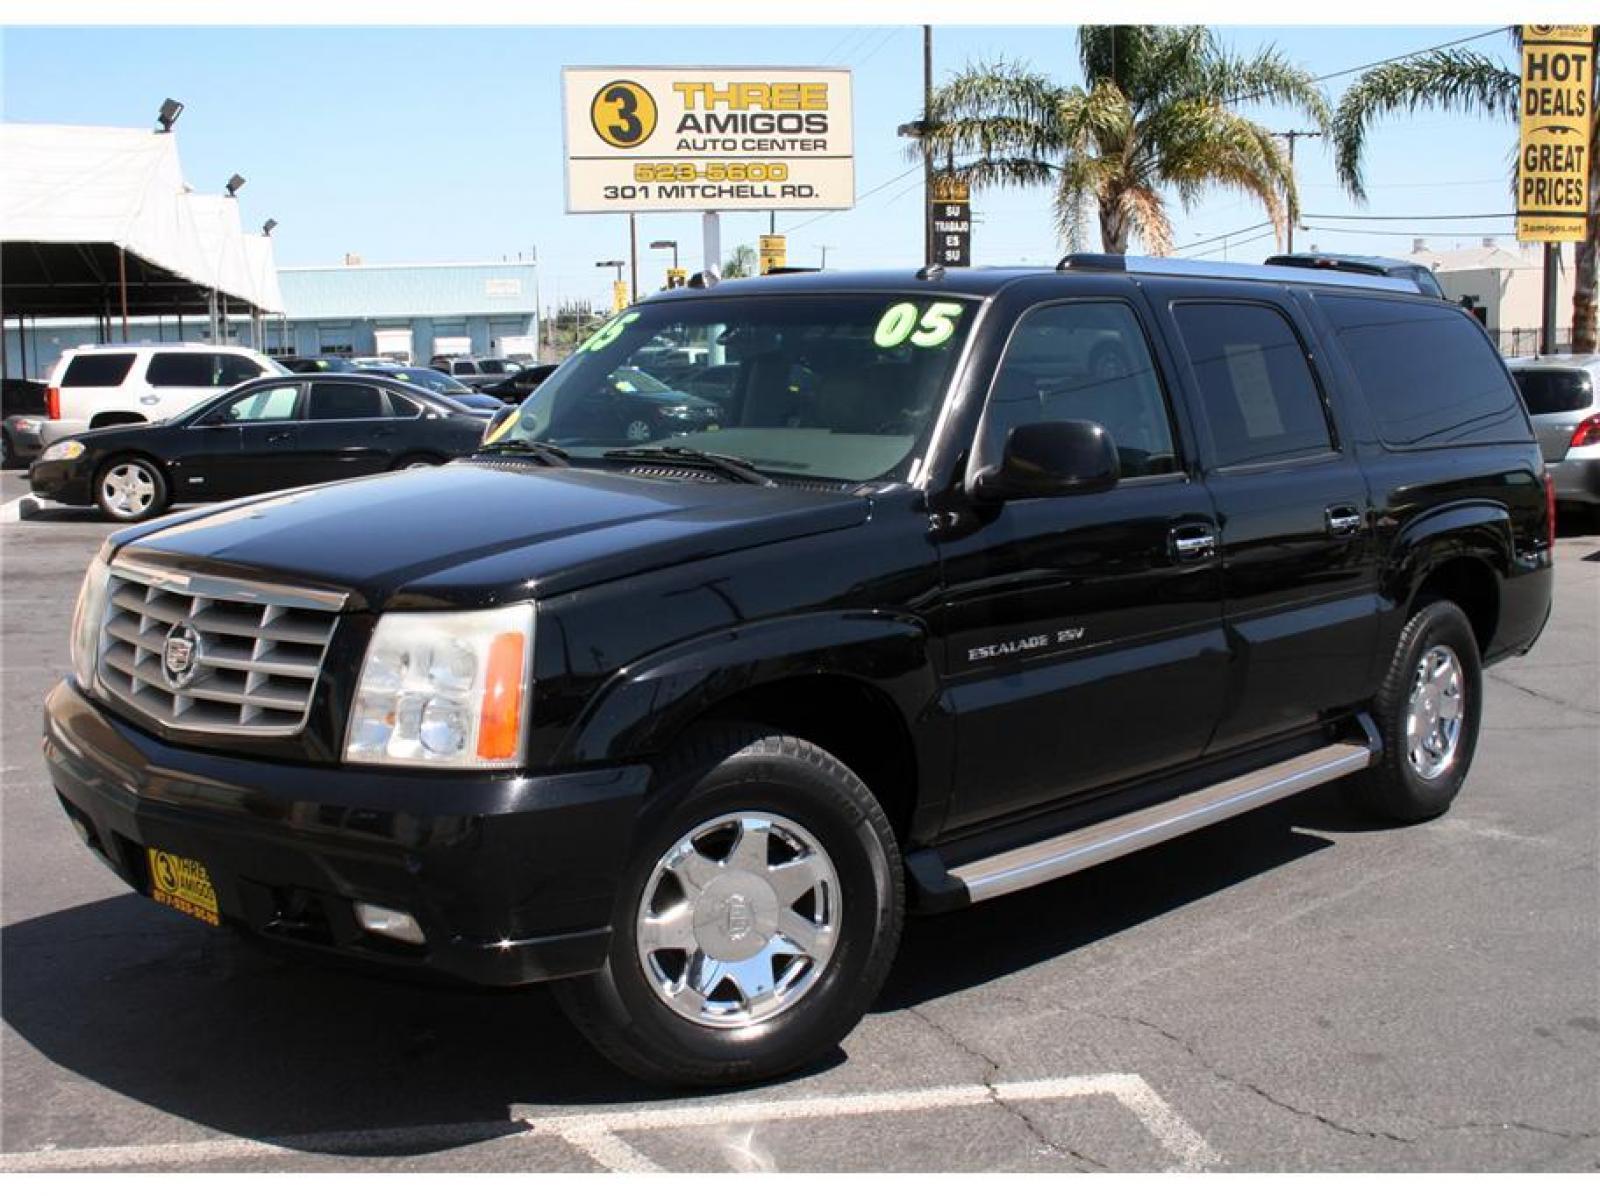 2005 Cadillac Escalade Esv Information And Photos Zomb